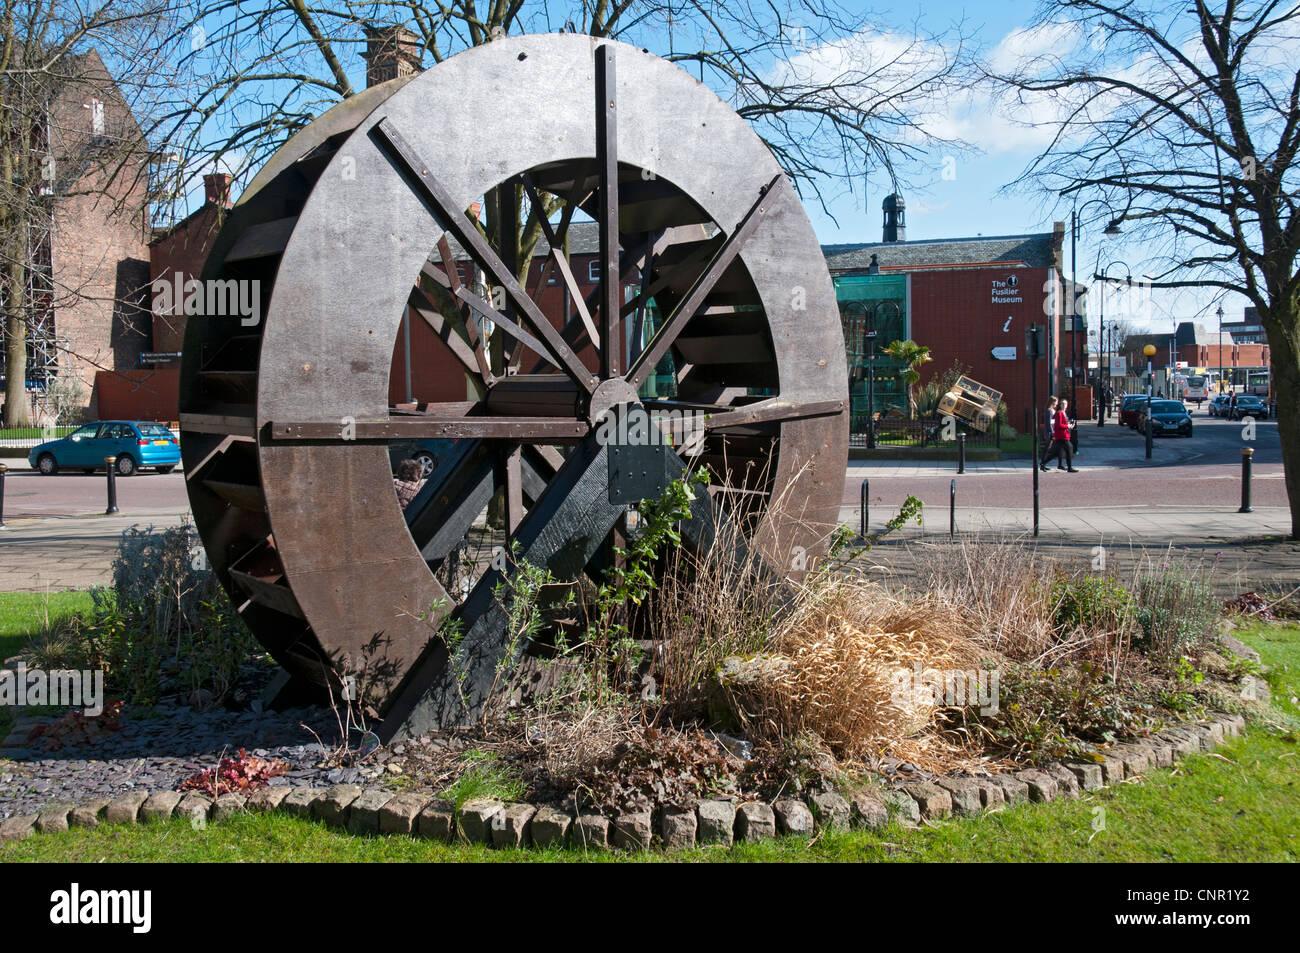 Imitation waterwheel in public gardens on Silver Street, Bury, Greater Manchester, England, UK - Stock Image